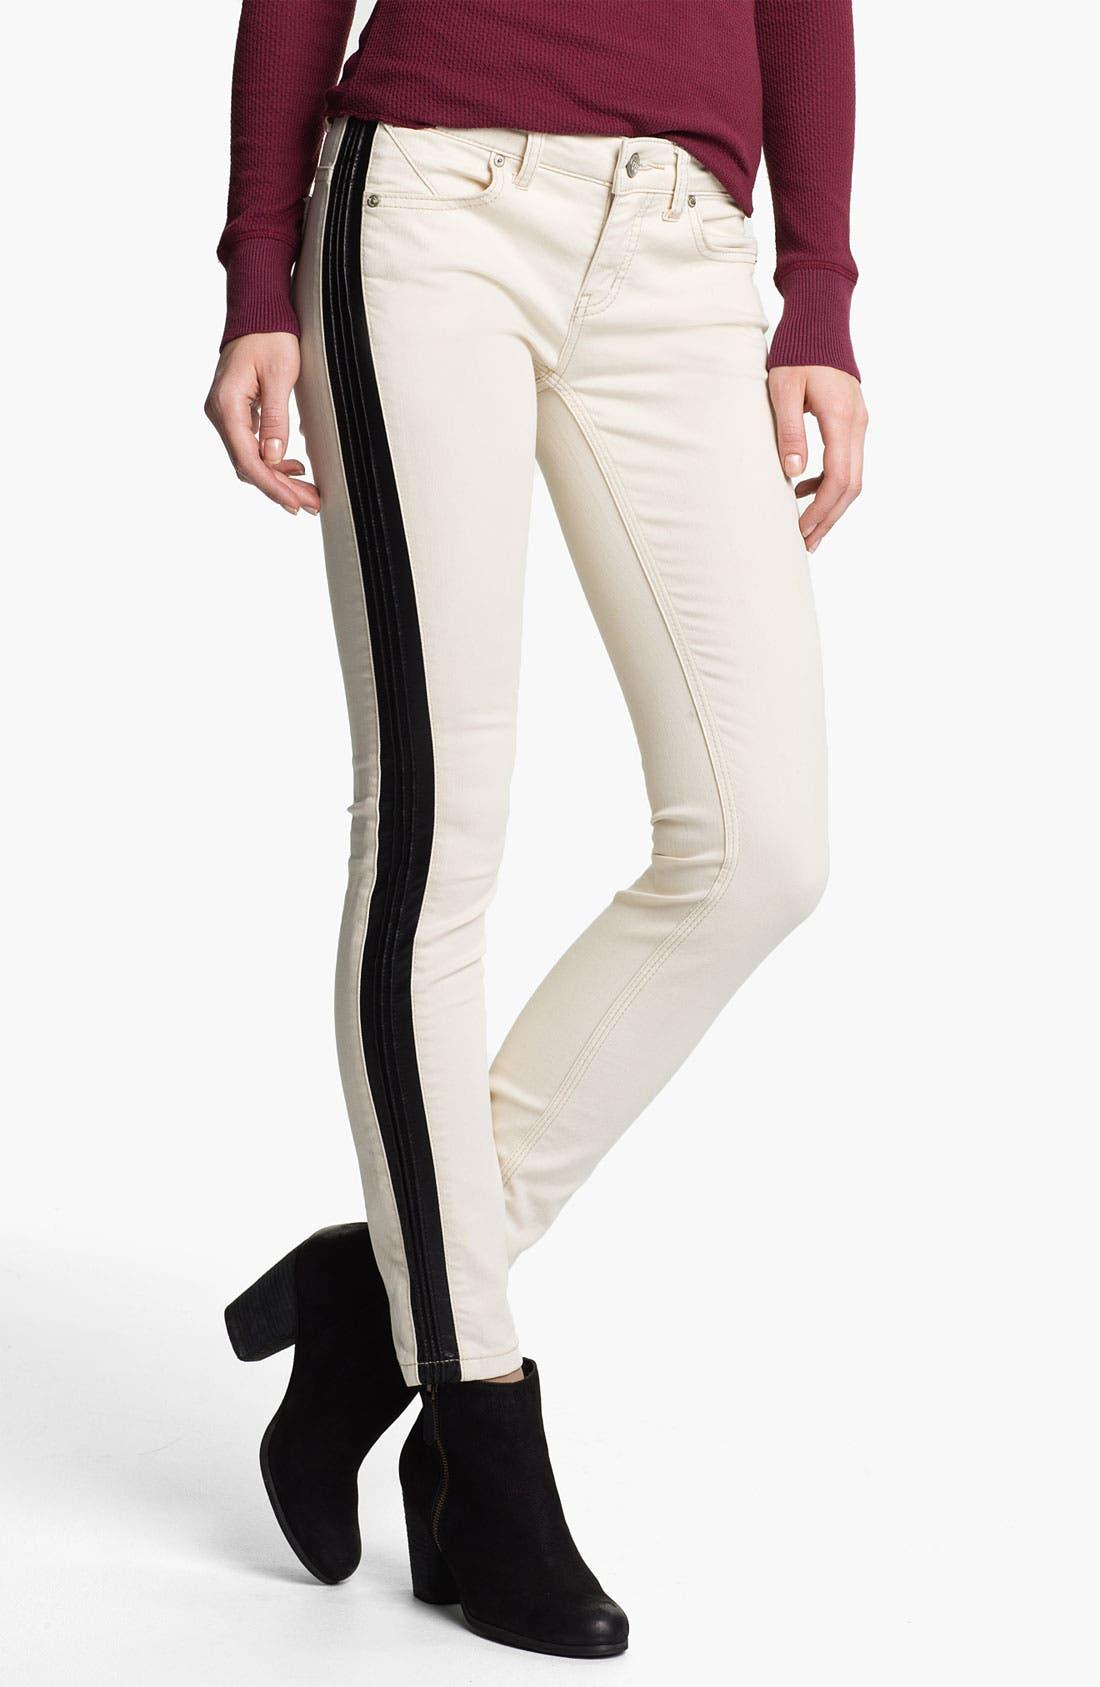 Alternate Image 1 Selected - Free People Faux Leather Stripe Skinny Jeans (Ecru)